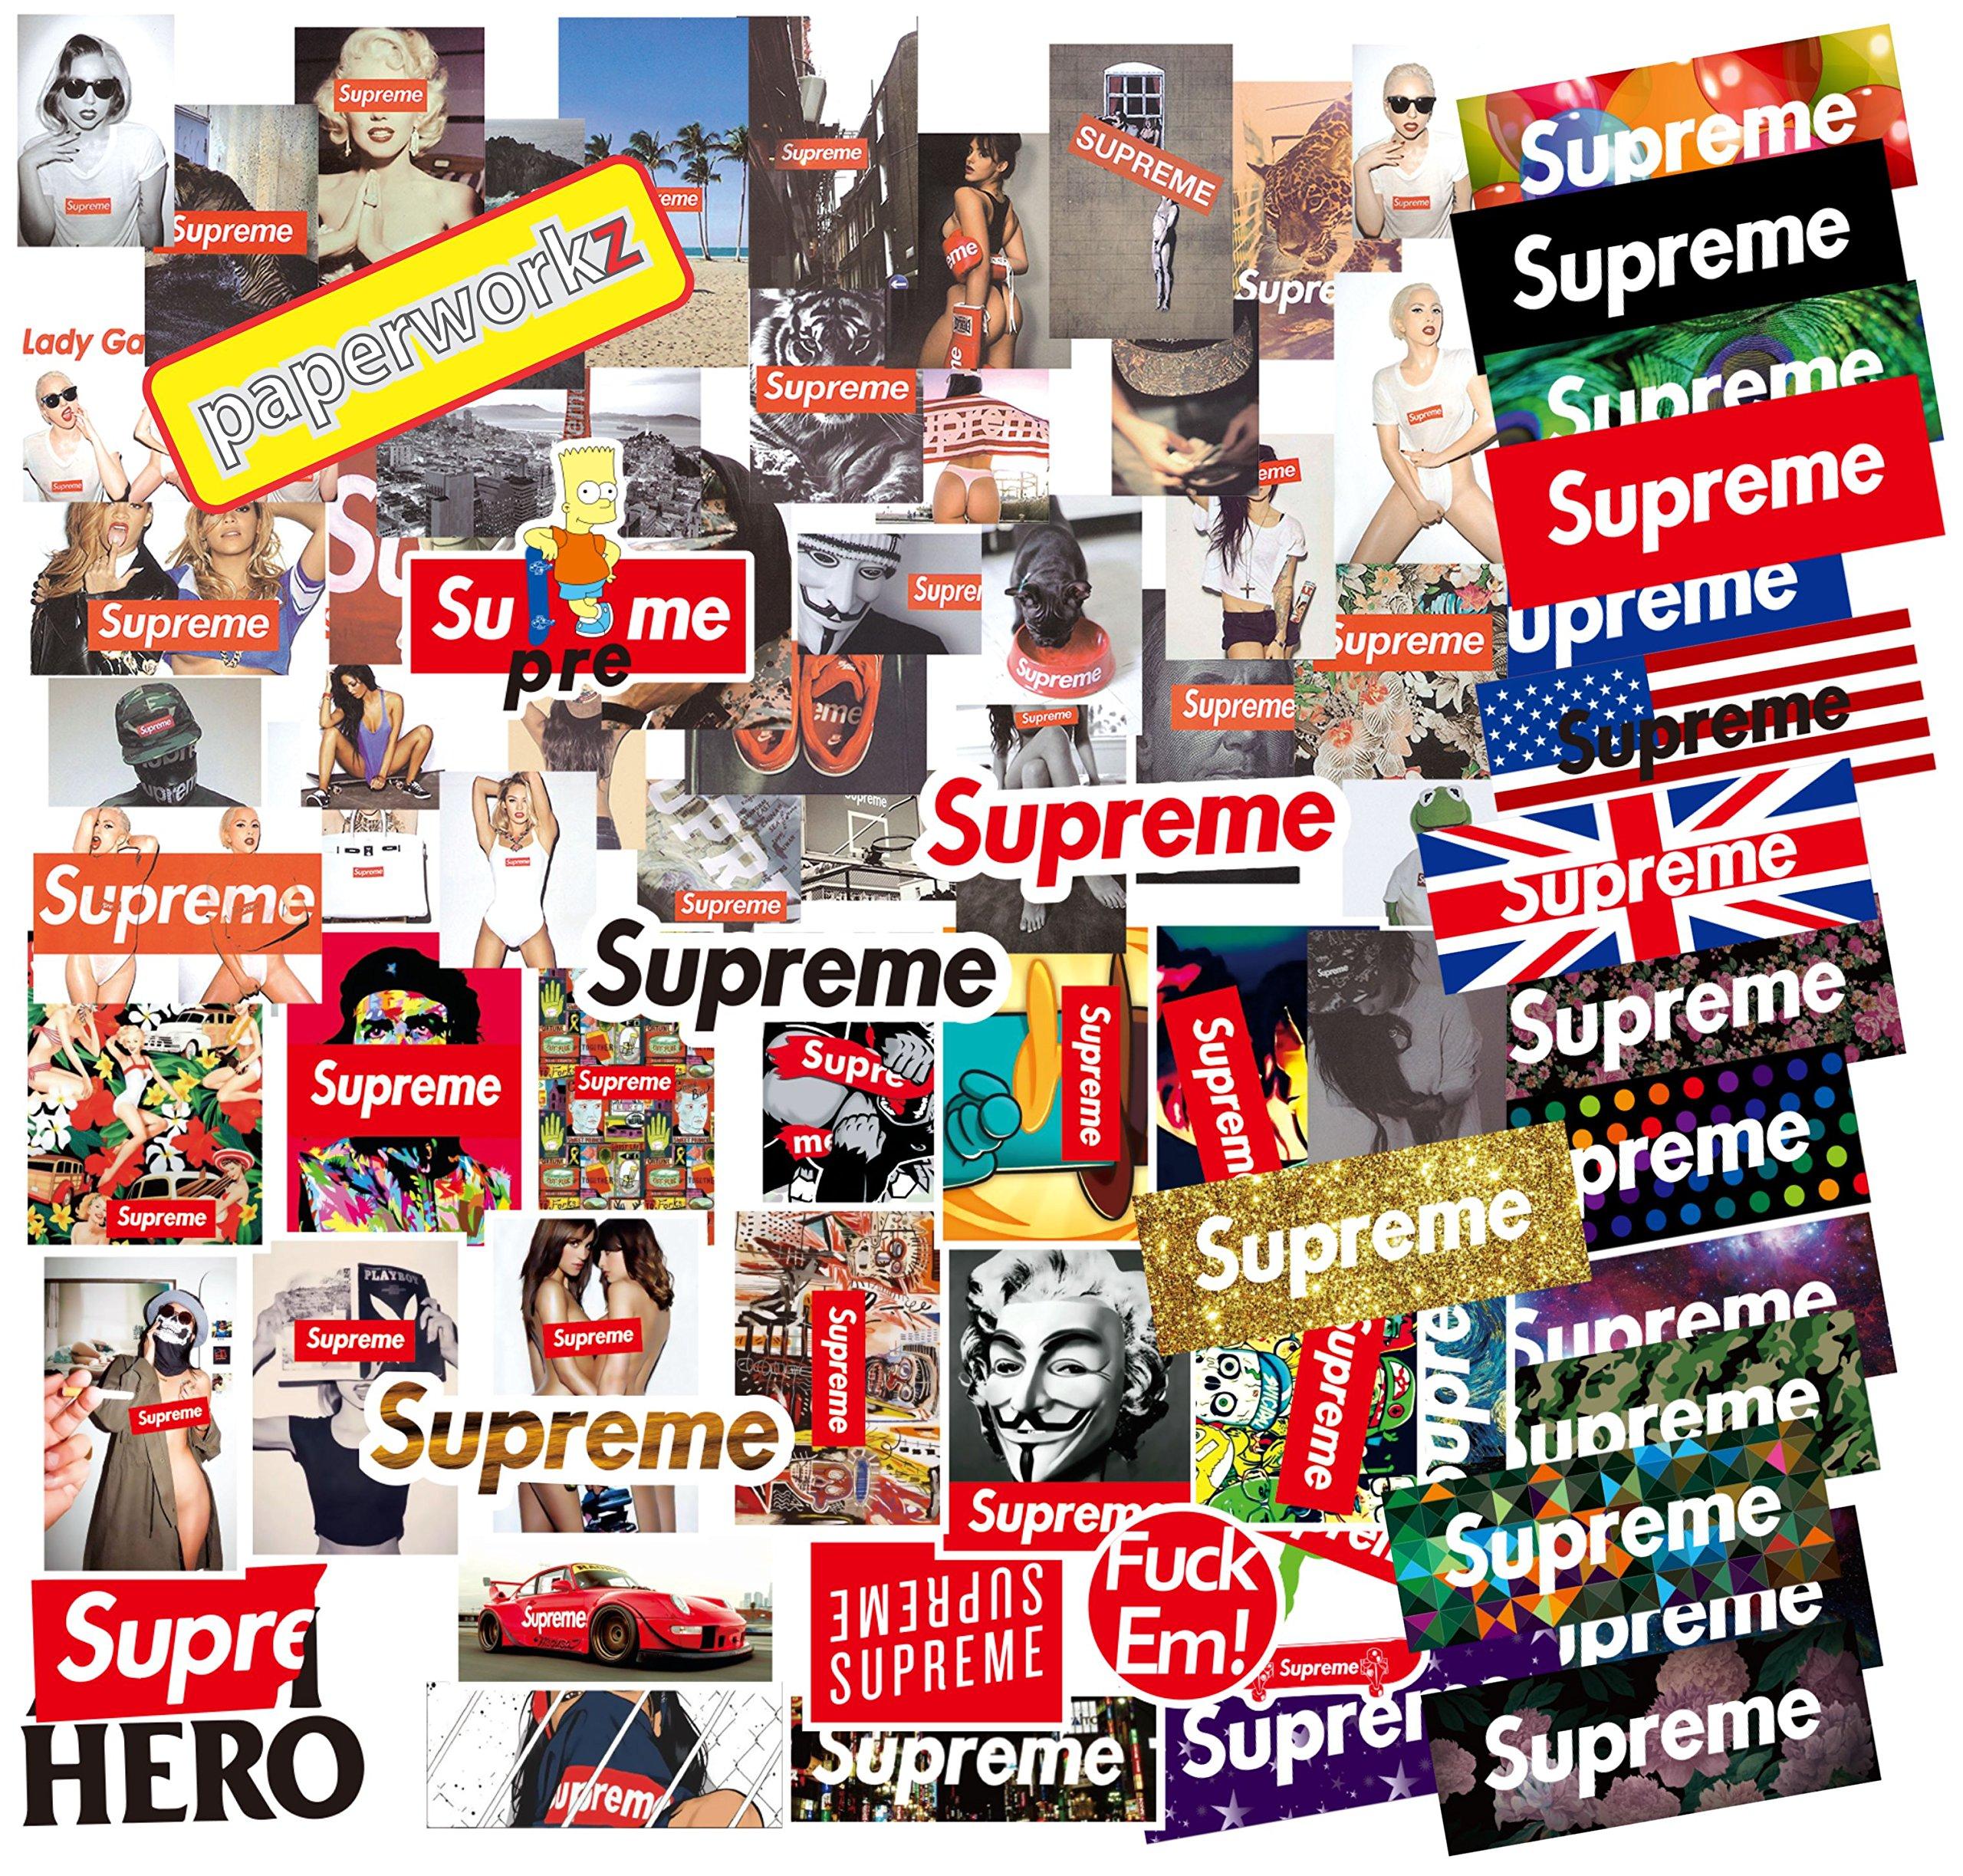 146pcs Stickers for Laptop, Skateboard, Luggage, Car, Bike or Guitar - Vinyl Decals Waterproof Graffiti Labels by paperworkz